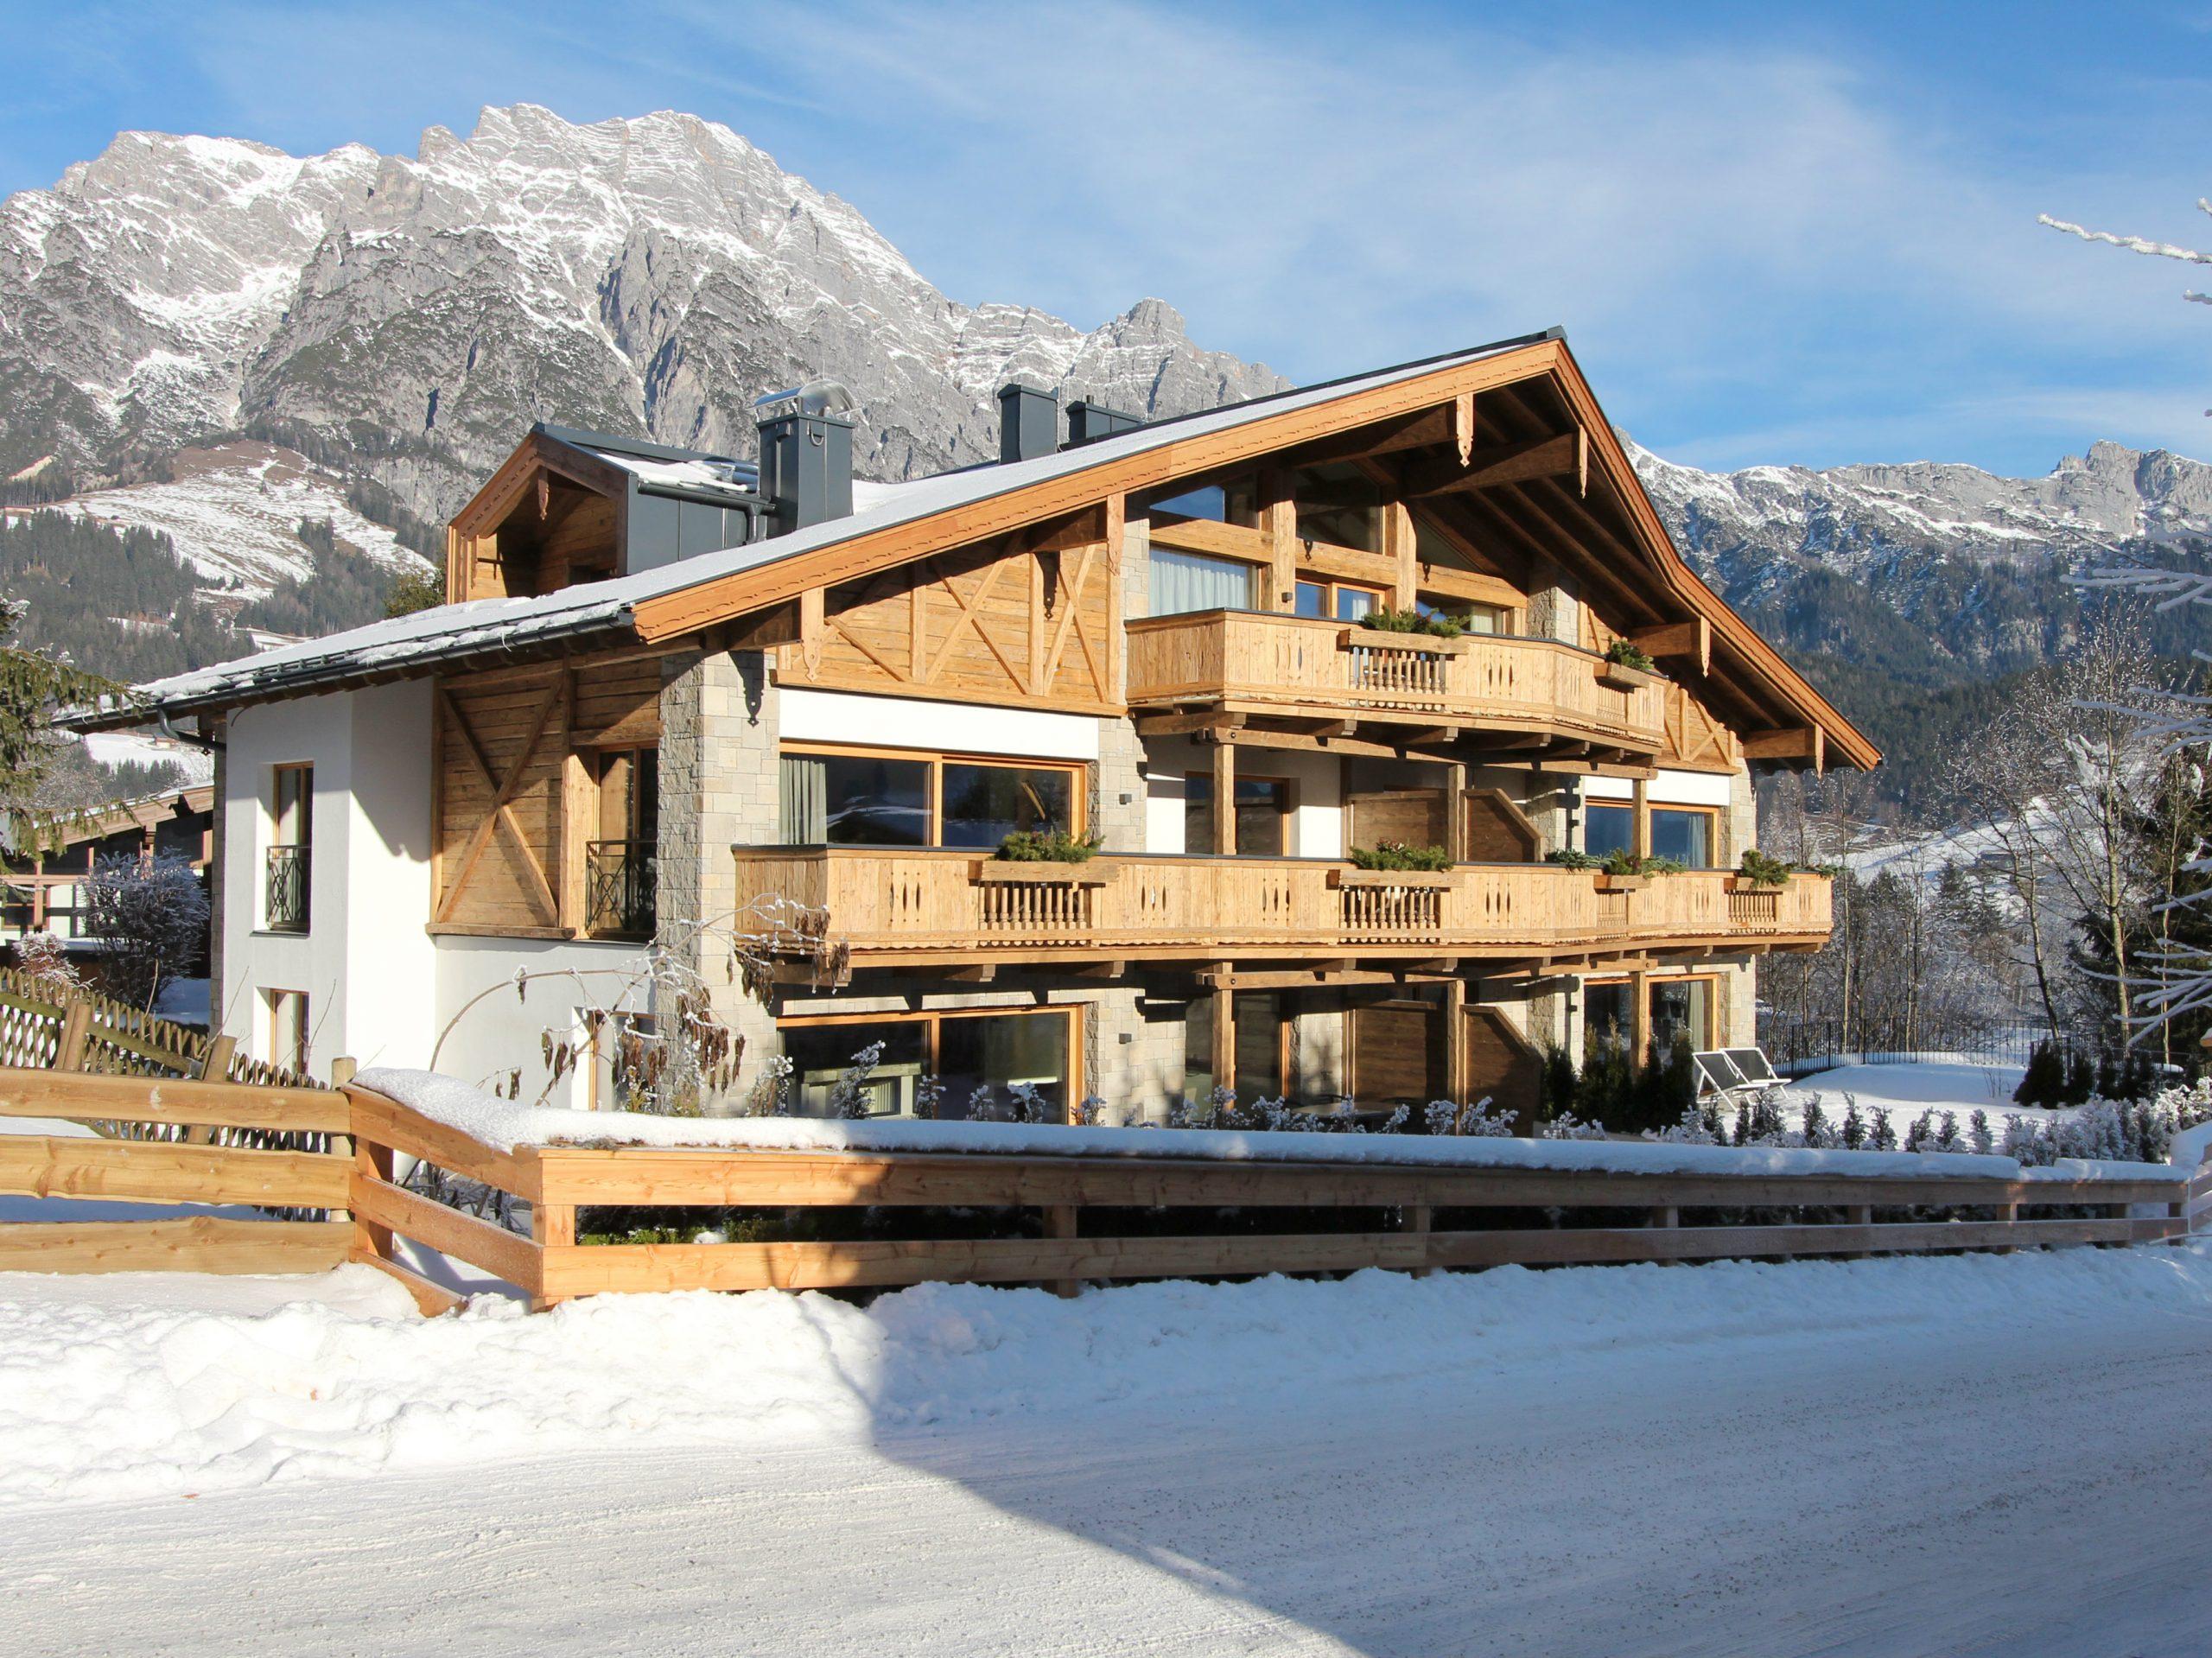 Chalet-appartement Alpin Lodge Leogang Lodge 3 - 6-8 personen